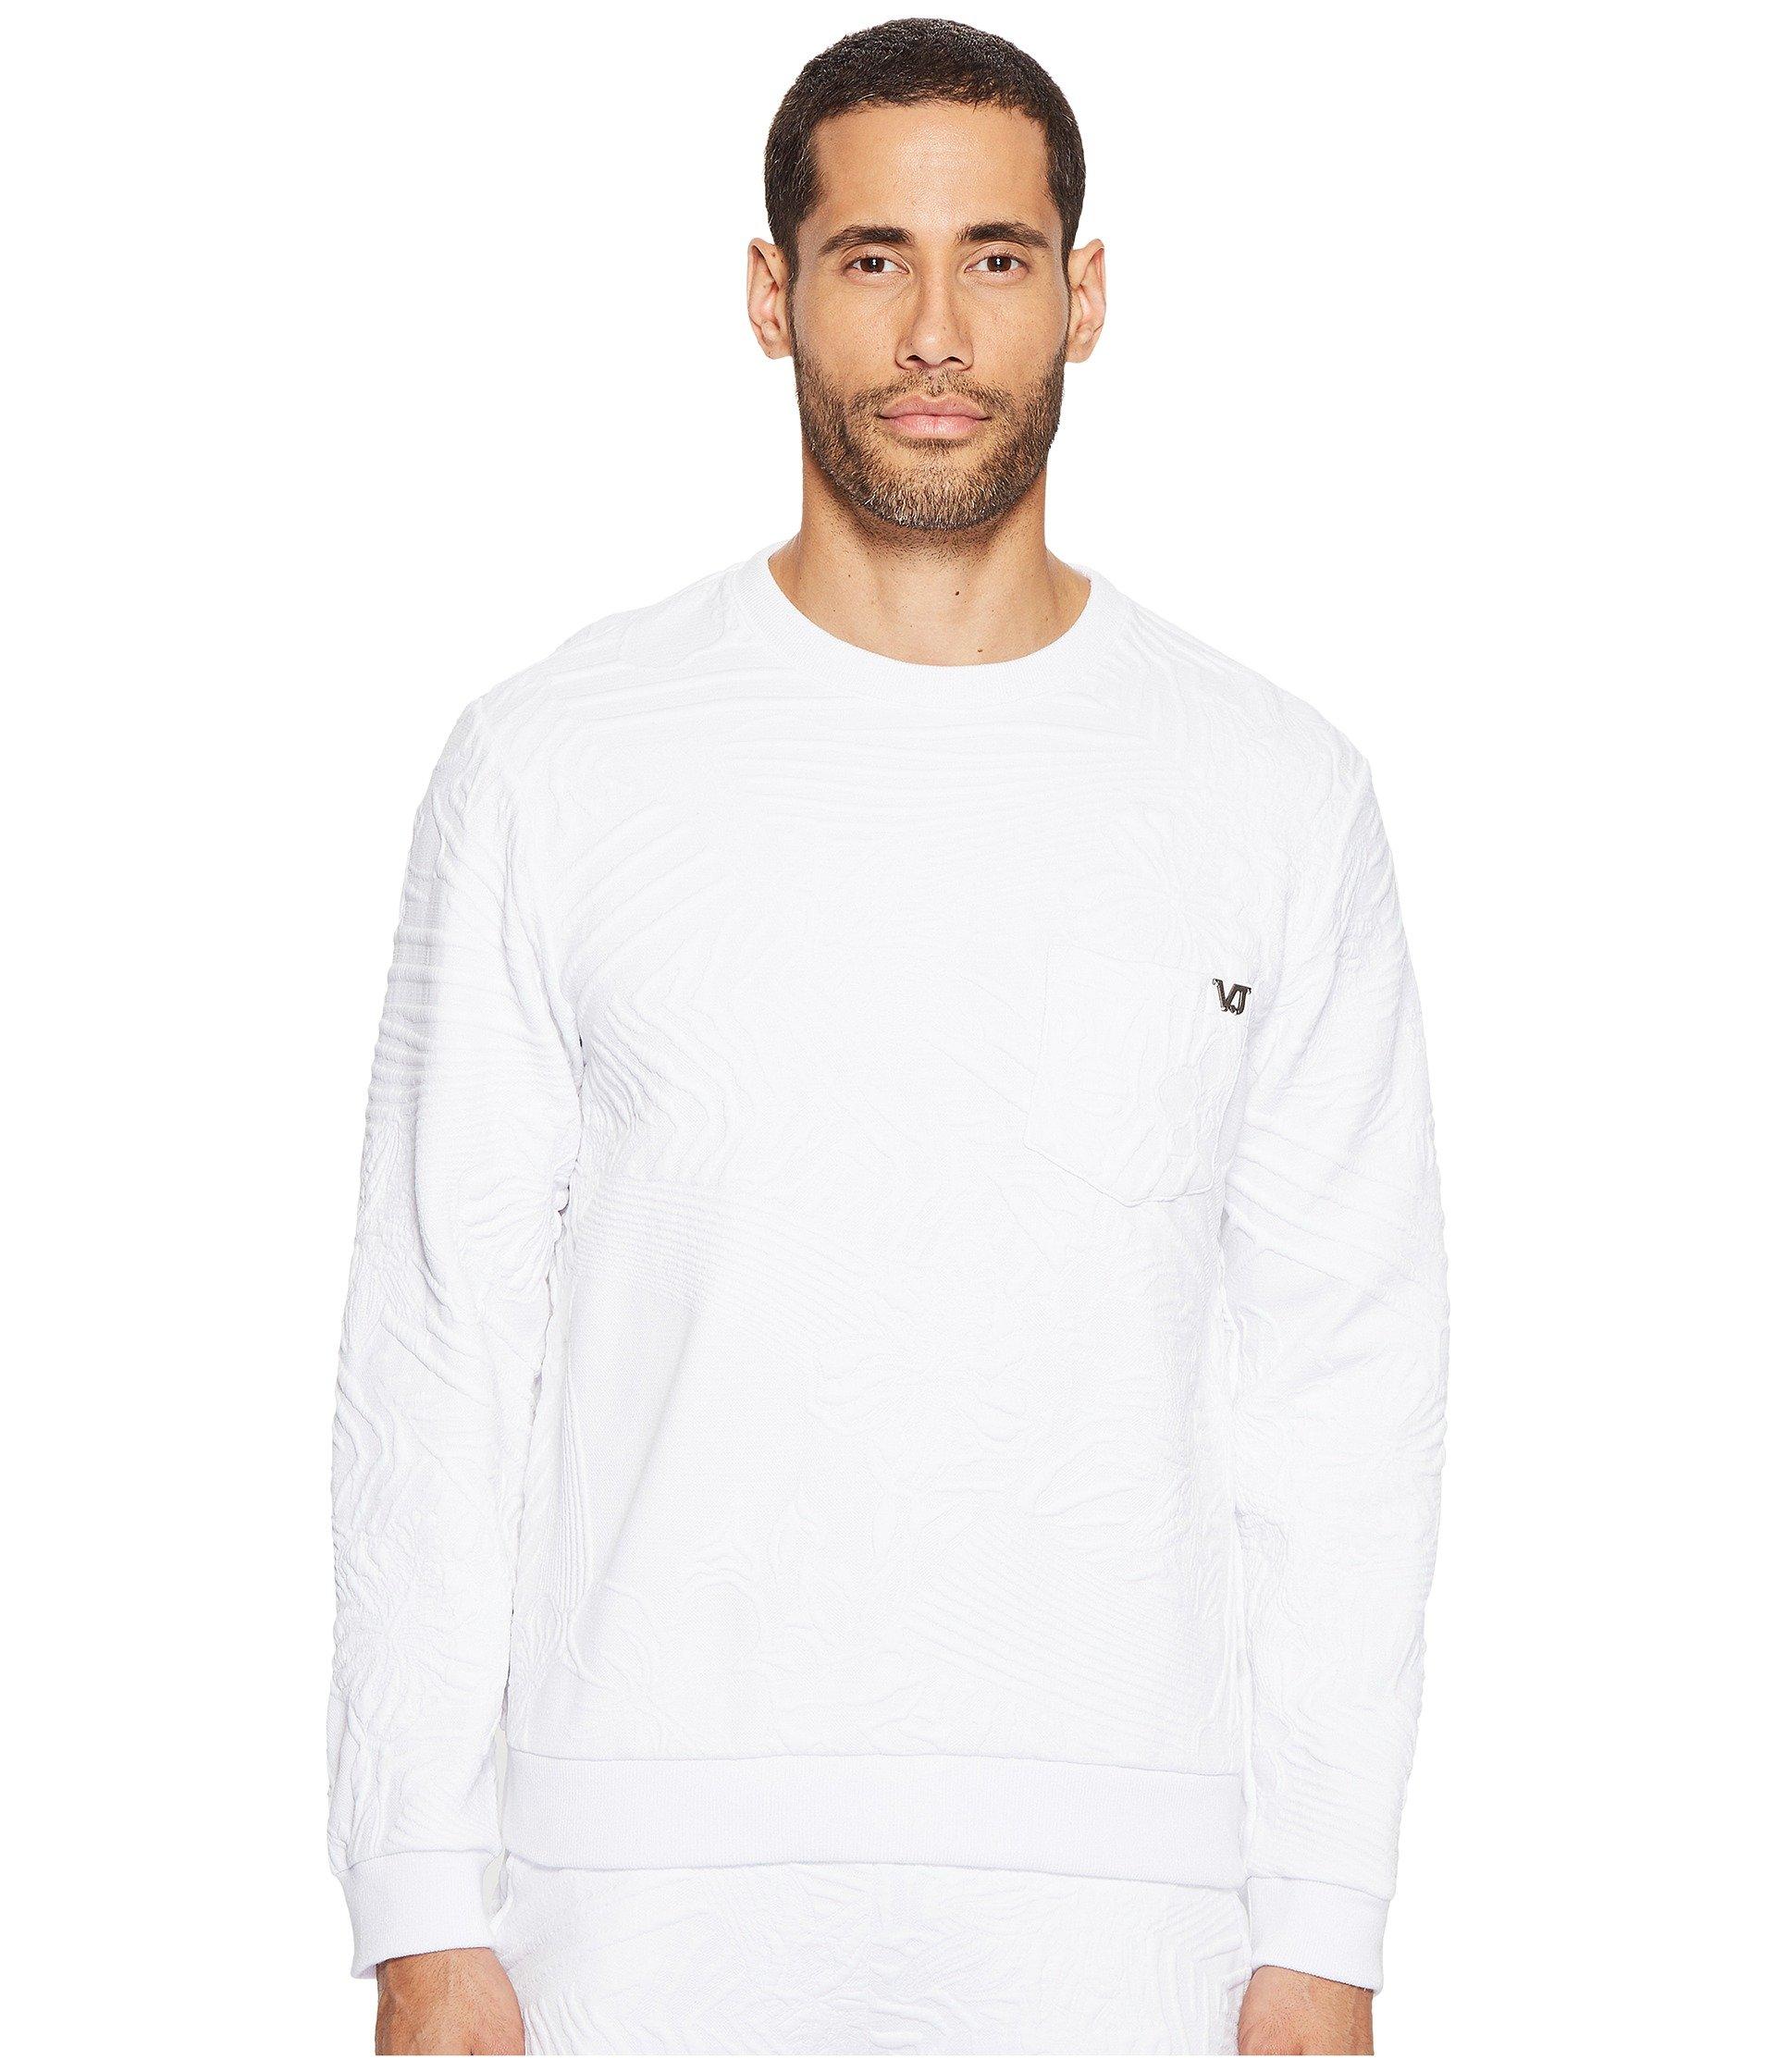 Buzo o Chaqueta Deportiva para Hombre Versace Jeans Light Sweater EB7GPB7FA  + Versace en VeoyCompro.net